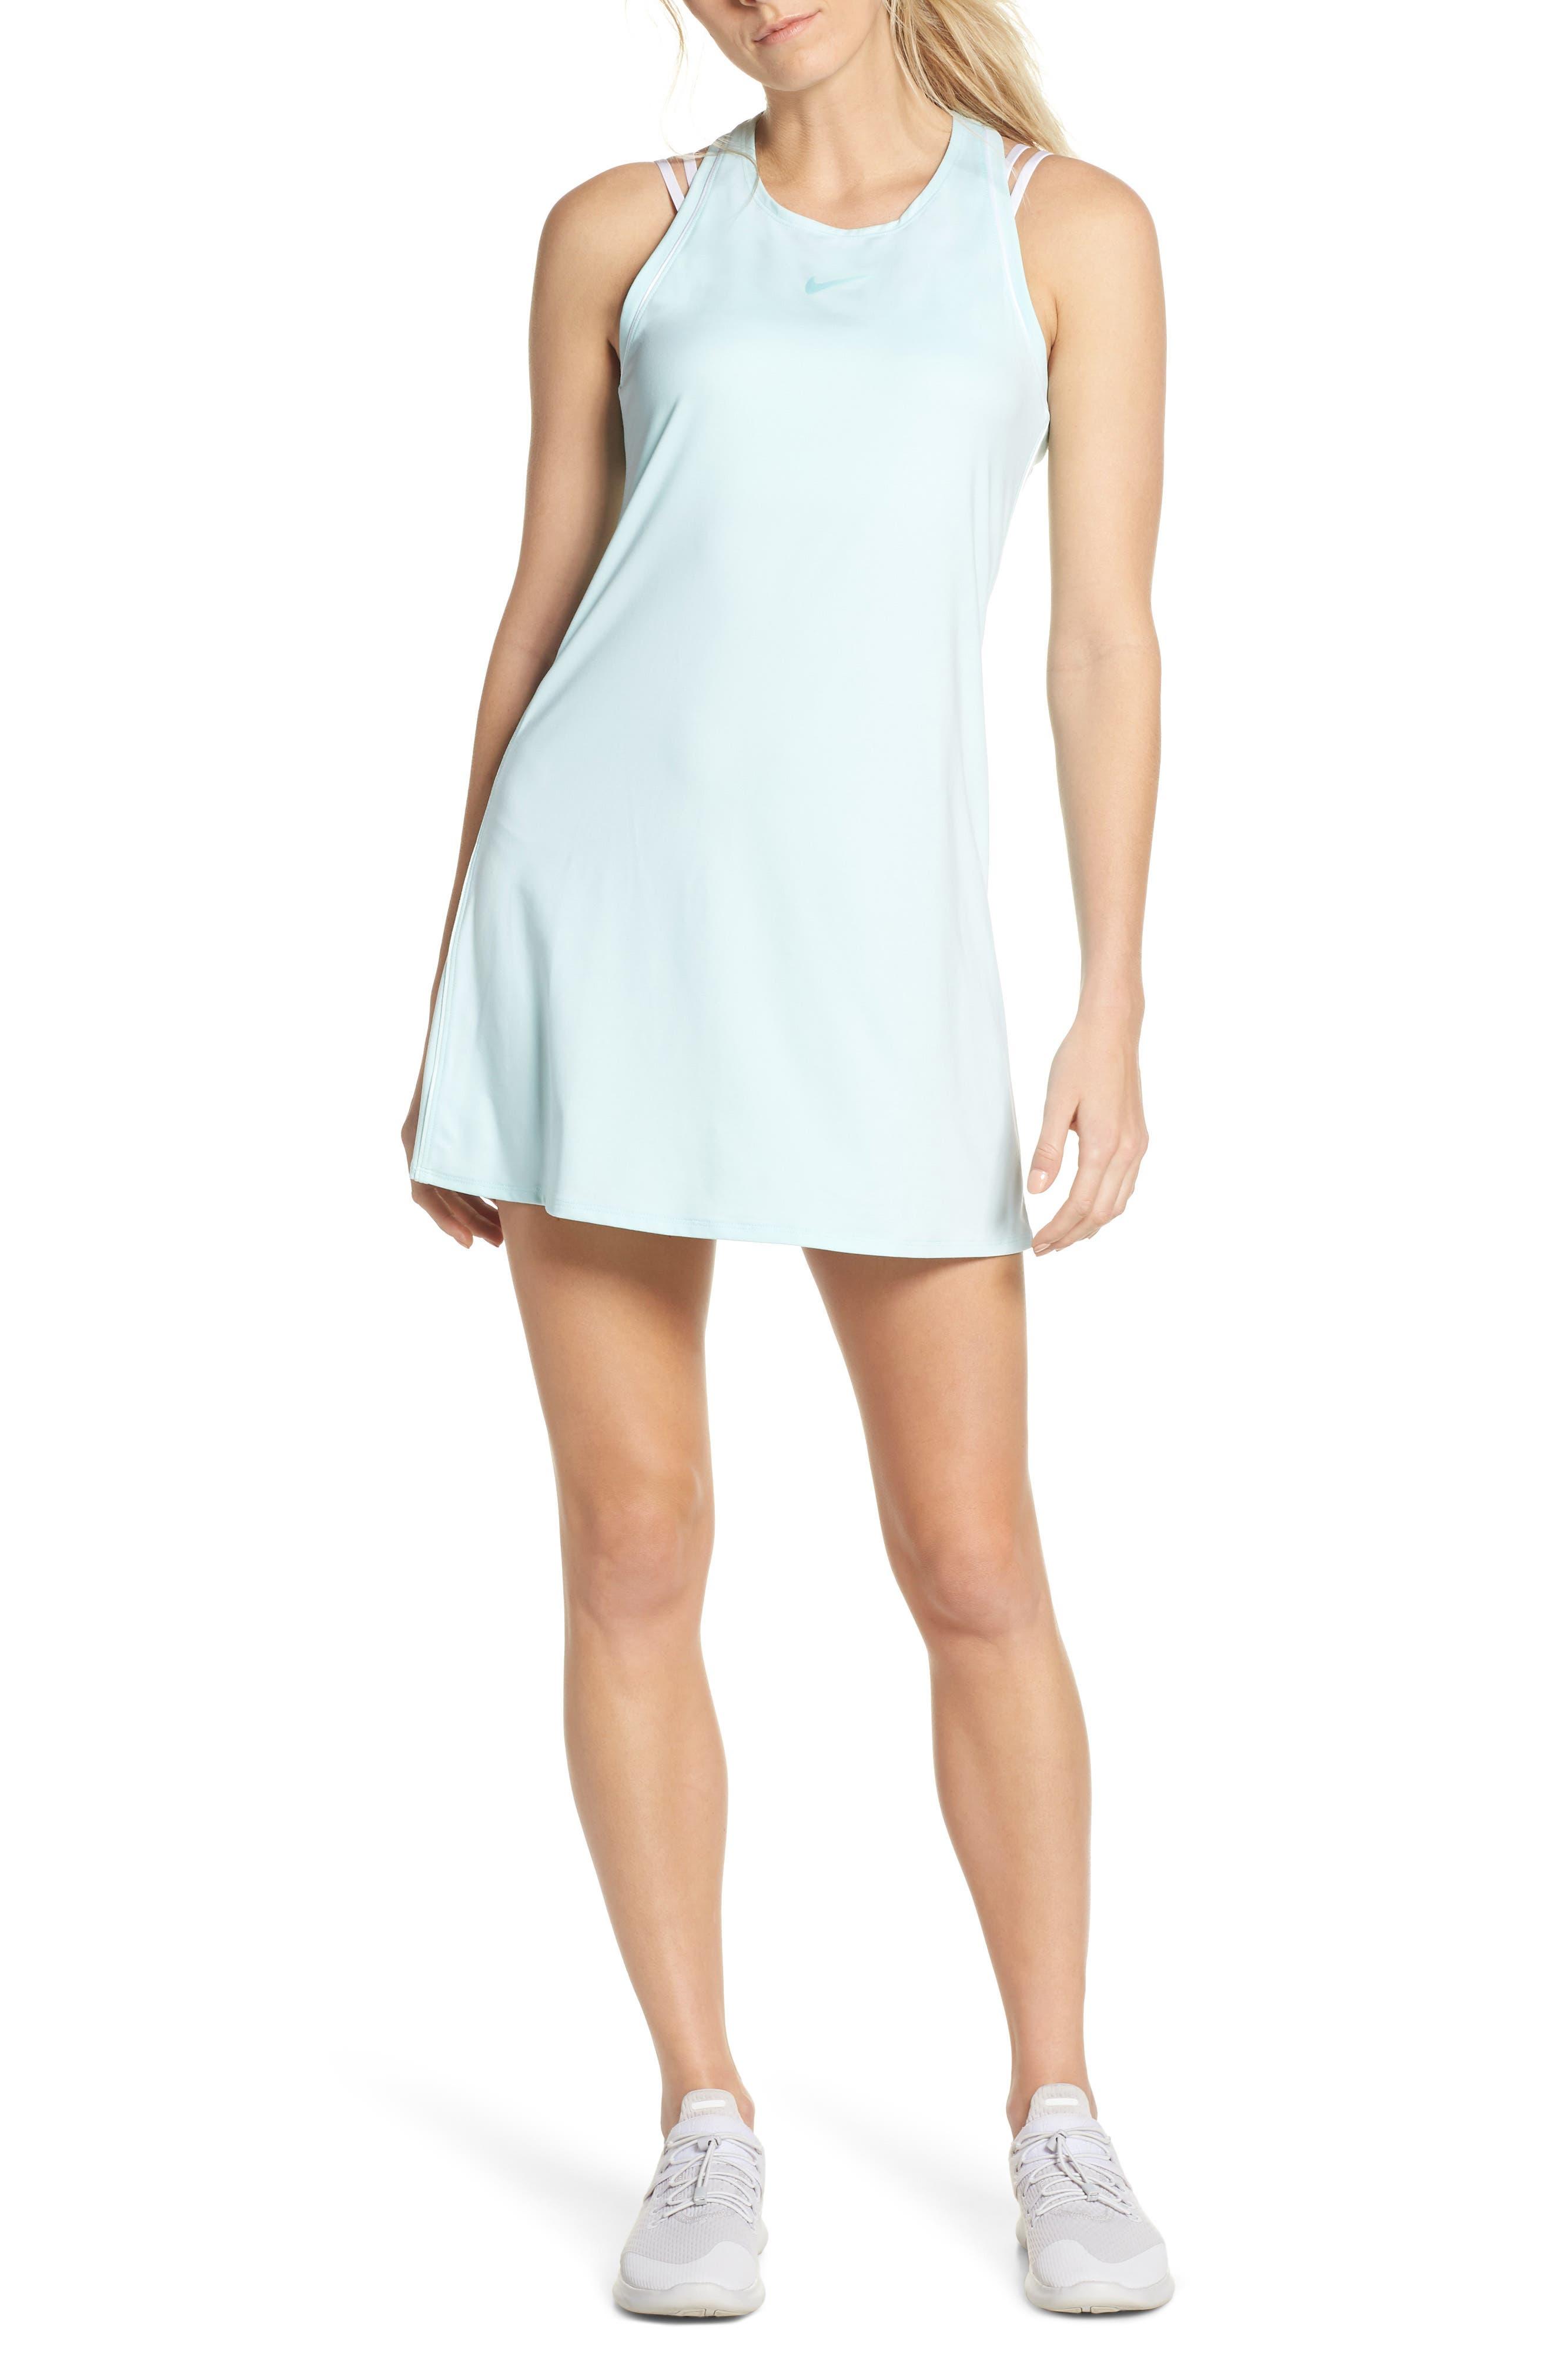 Nike Court Dry Tennis Dress